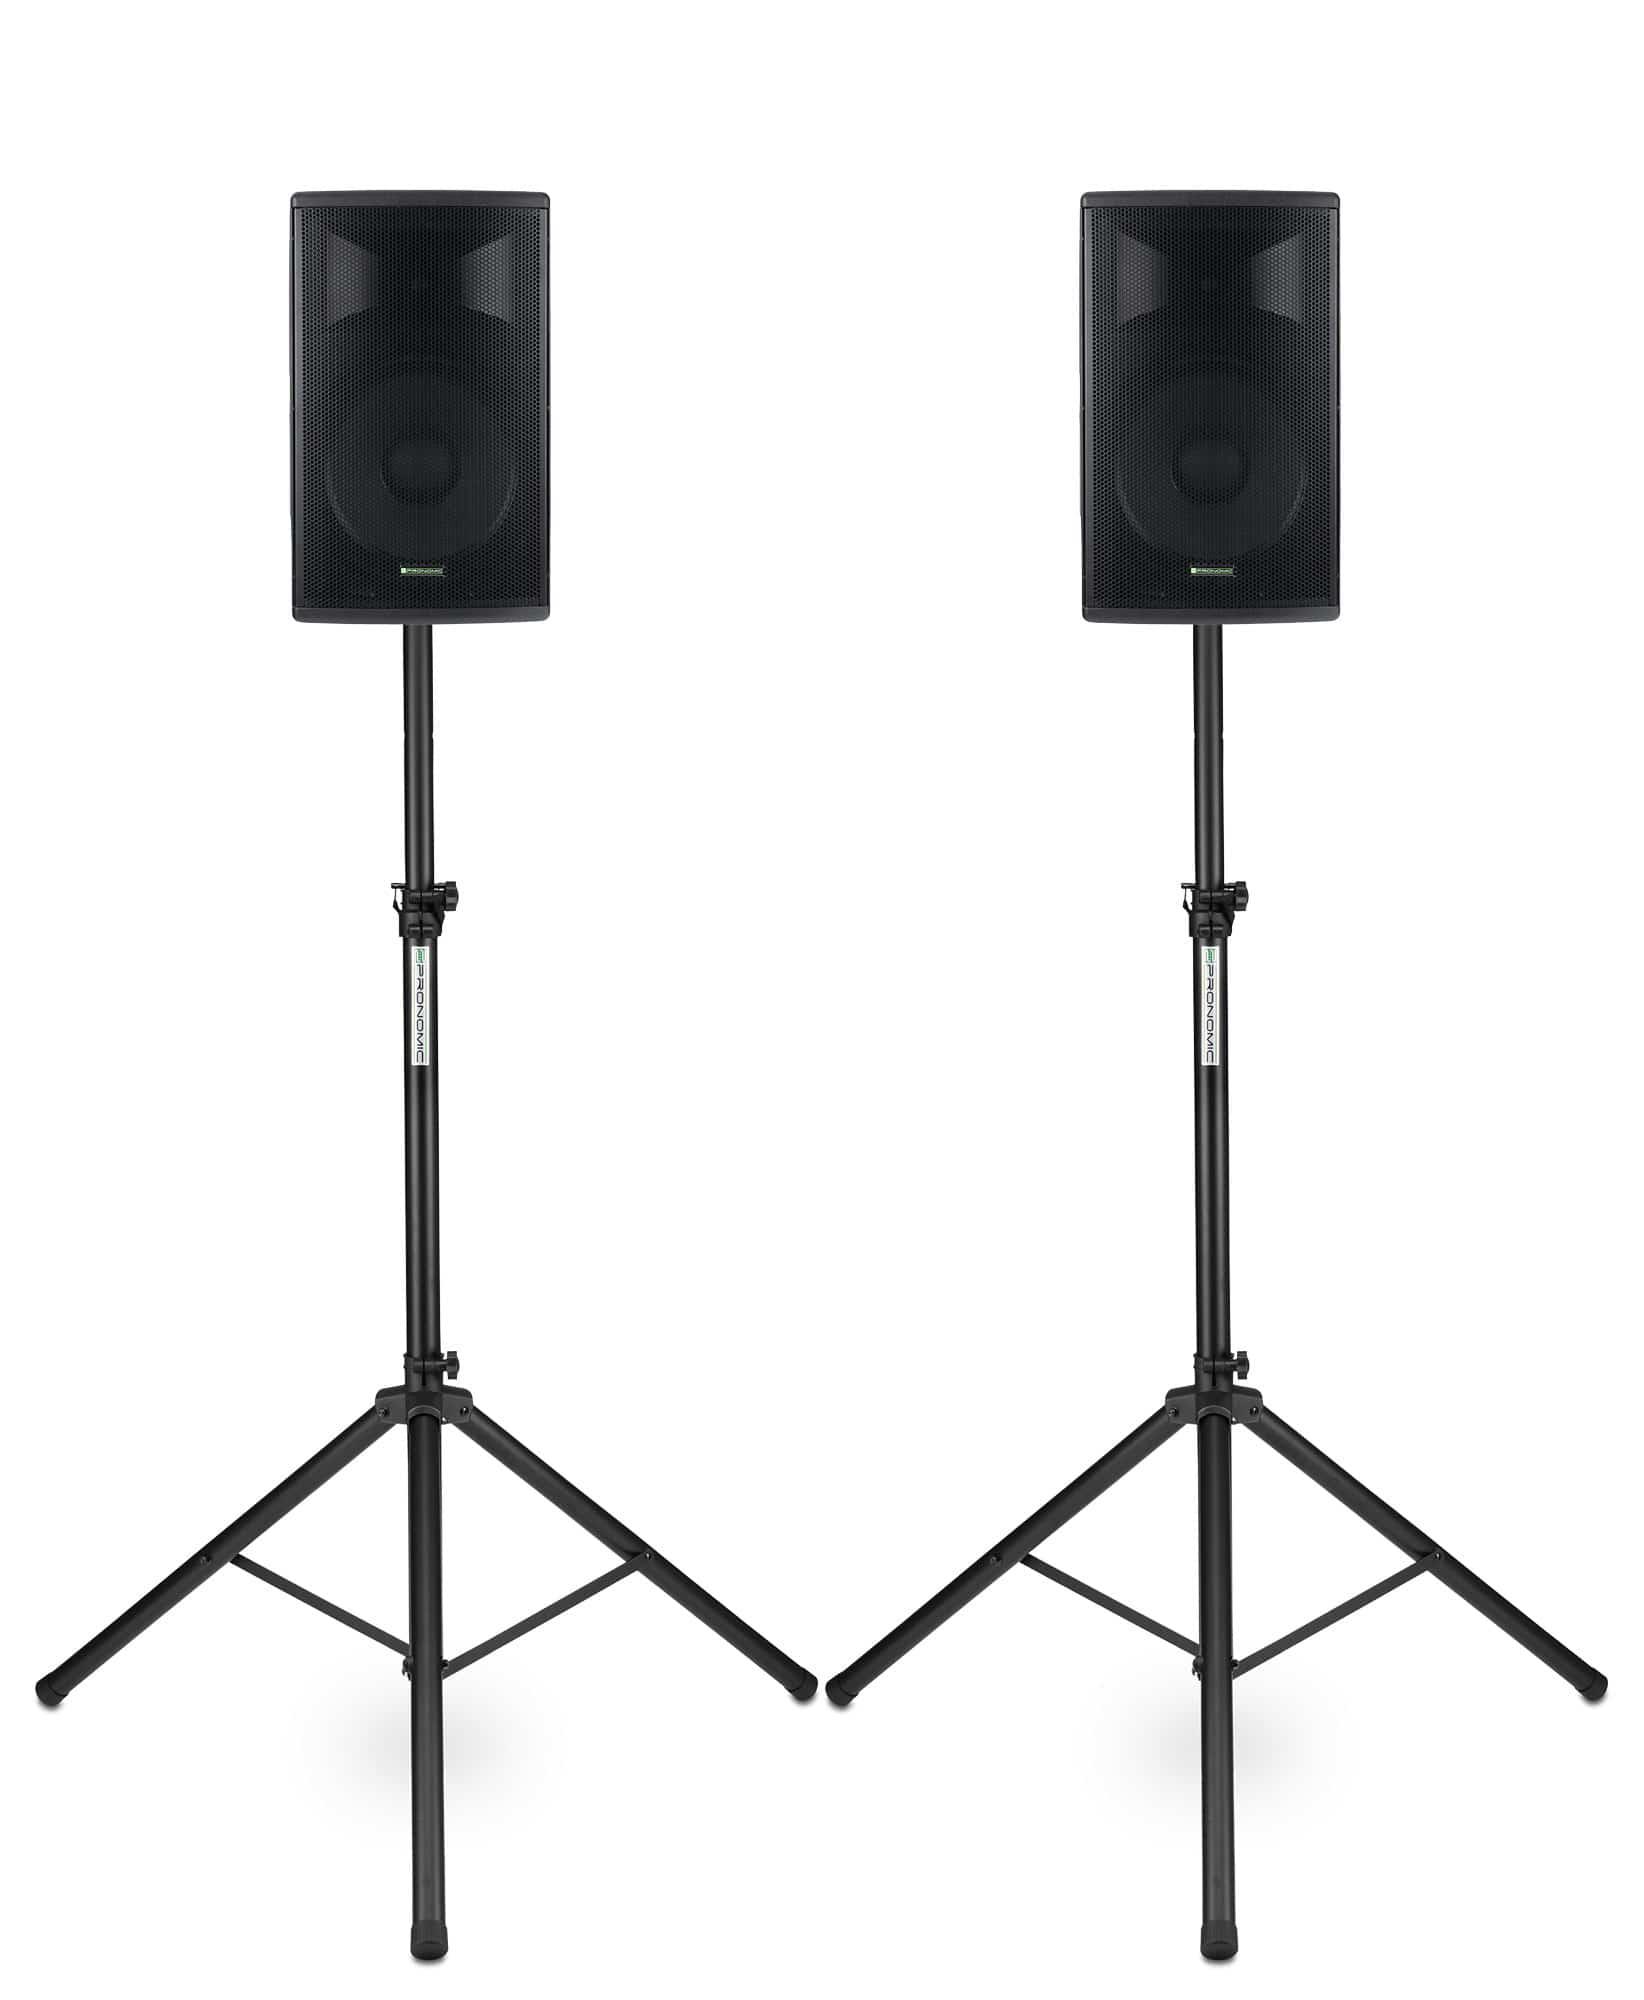 Paboxen - Pronomic E 210 MA 10 Aktivbox 400 Watt Stativ Set - Onlineshop Musikhaus Kirstein